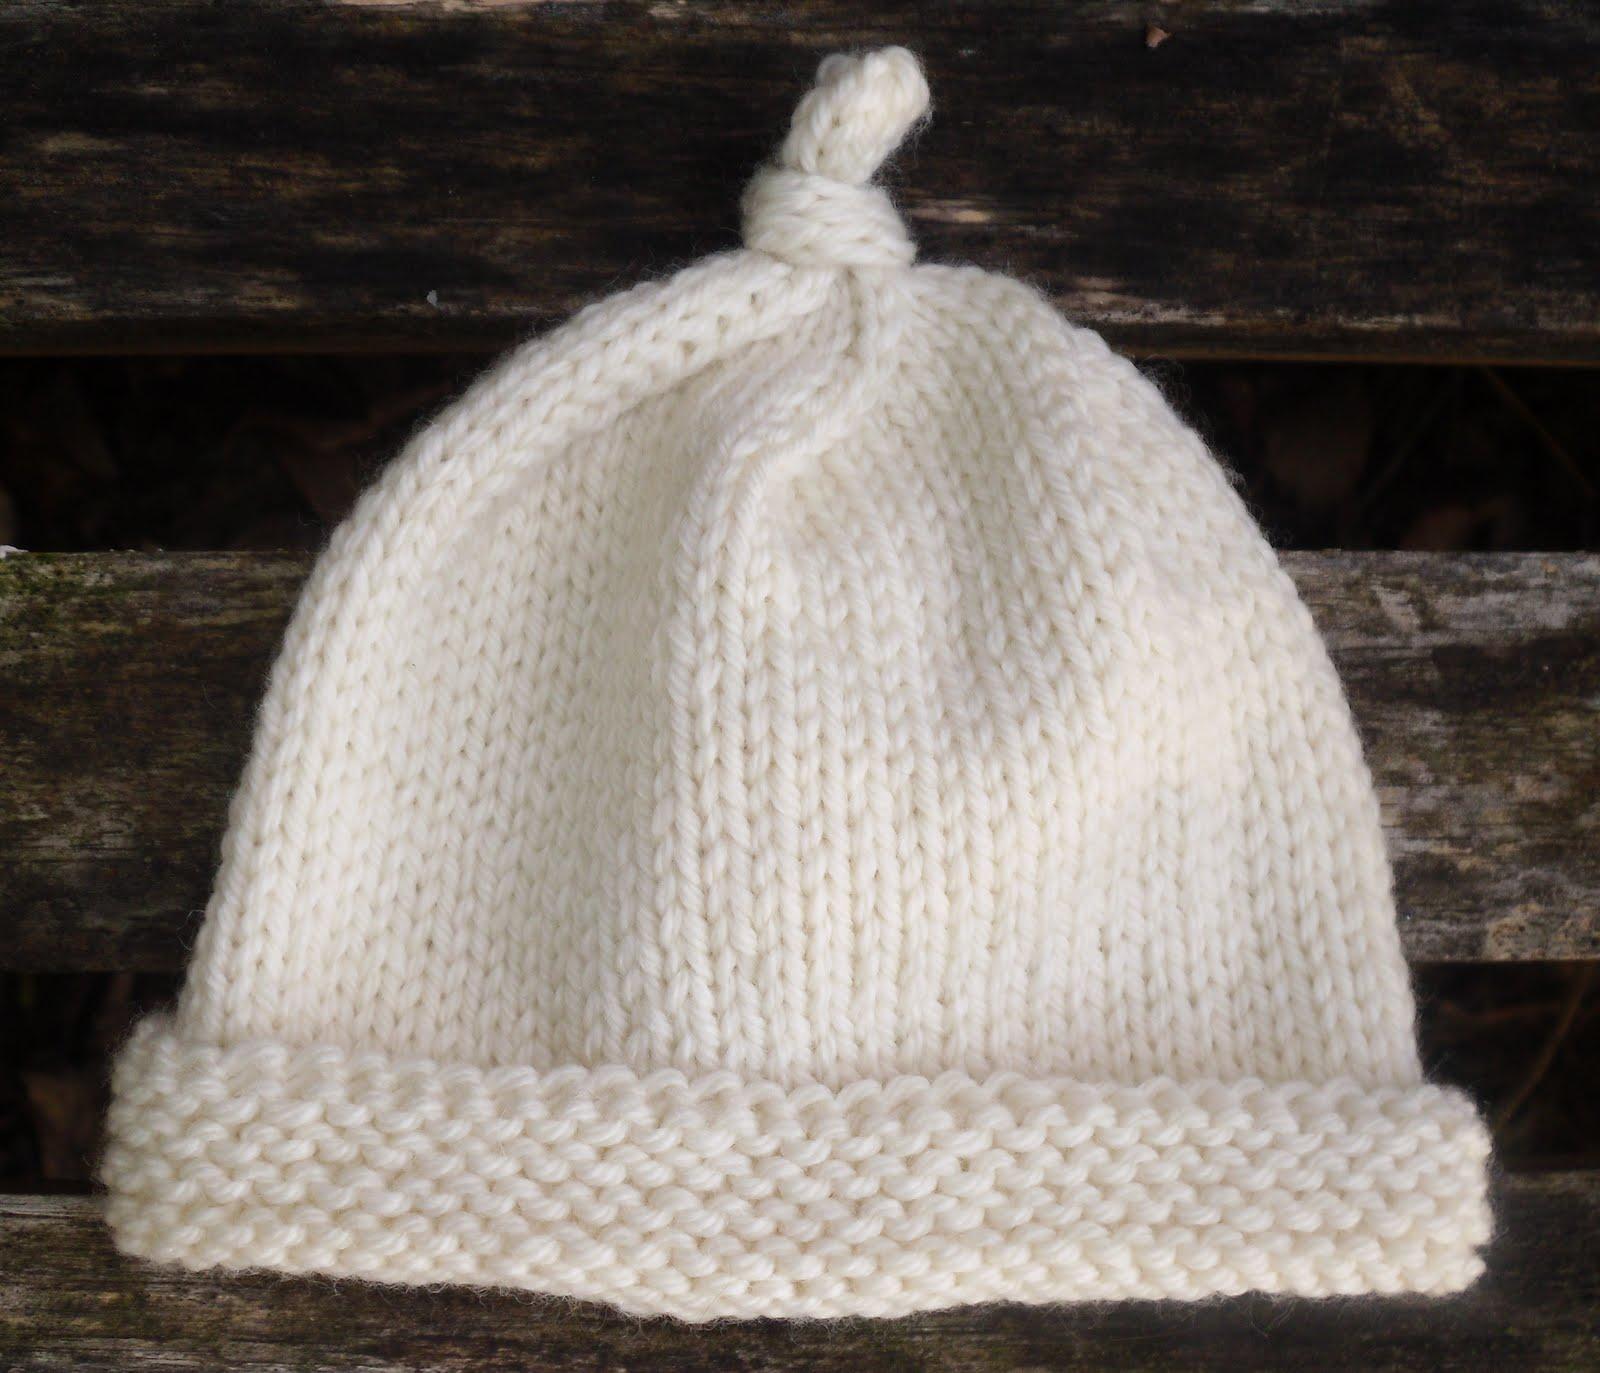 Knitting Pattern Baby Hat Worsted Weight Yarn : Rachels Knits: Newborn Knotty Hat